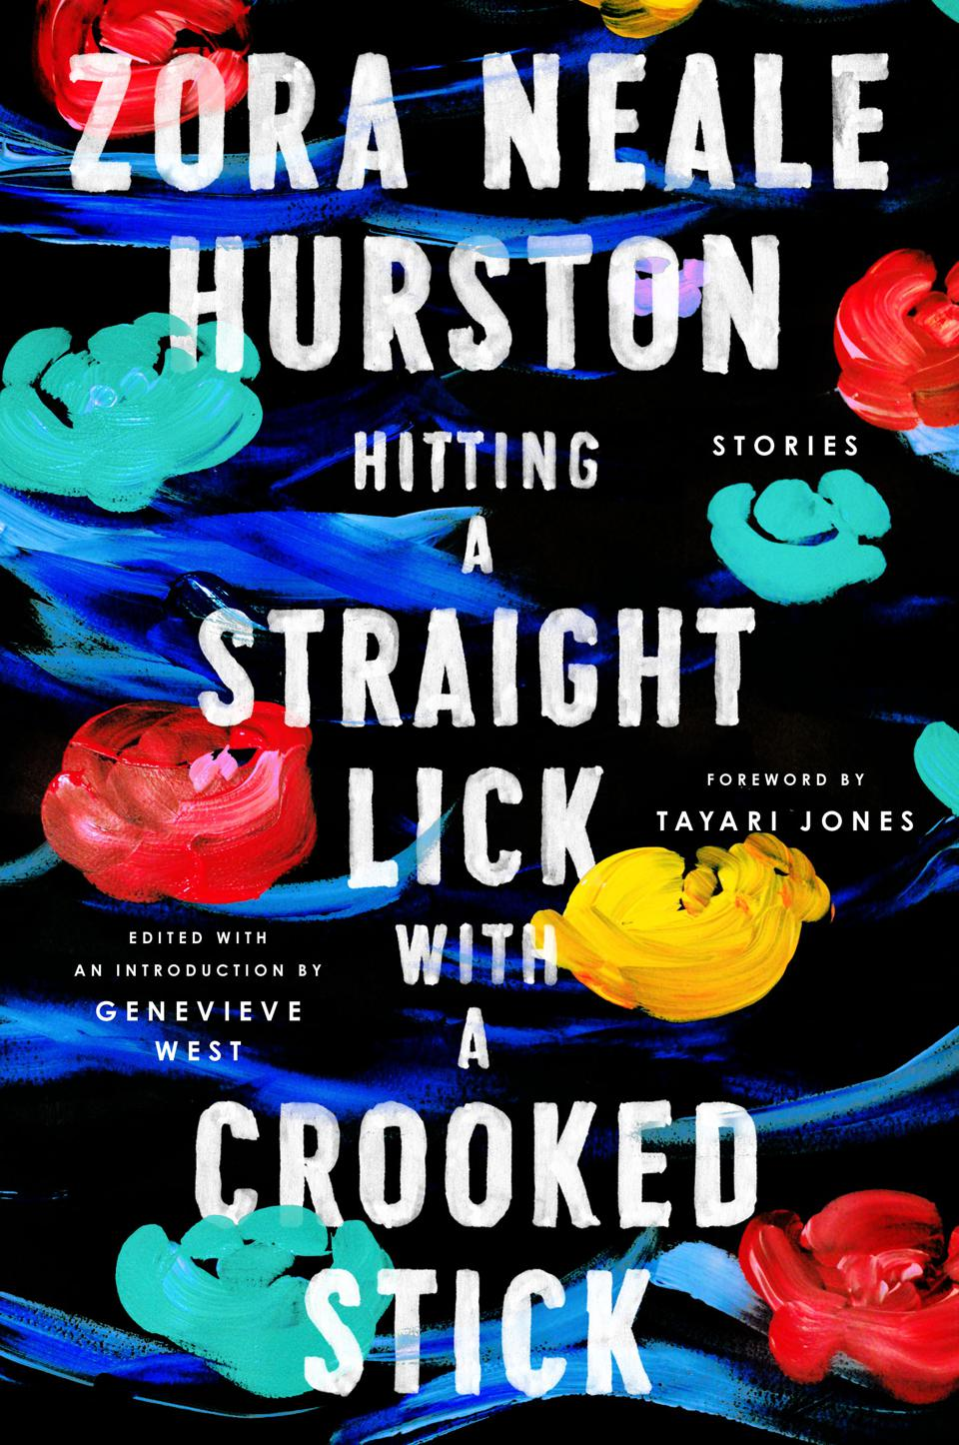 zora neale hurston hitting straight lick crooked stick harlem renaissance stories cover